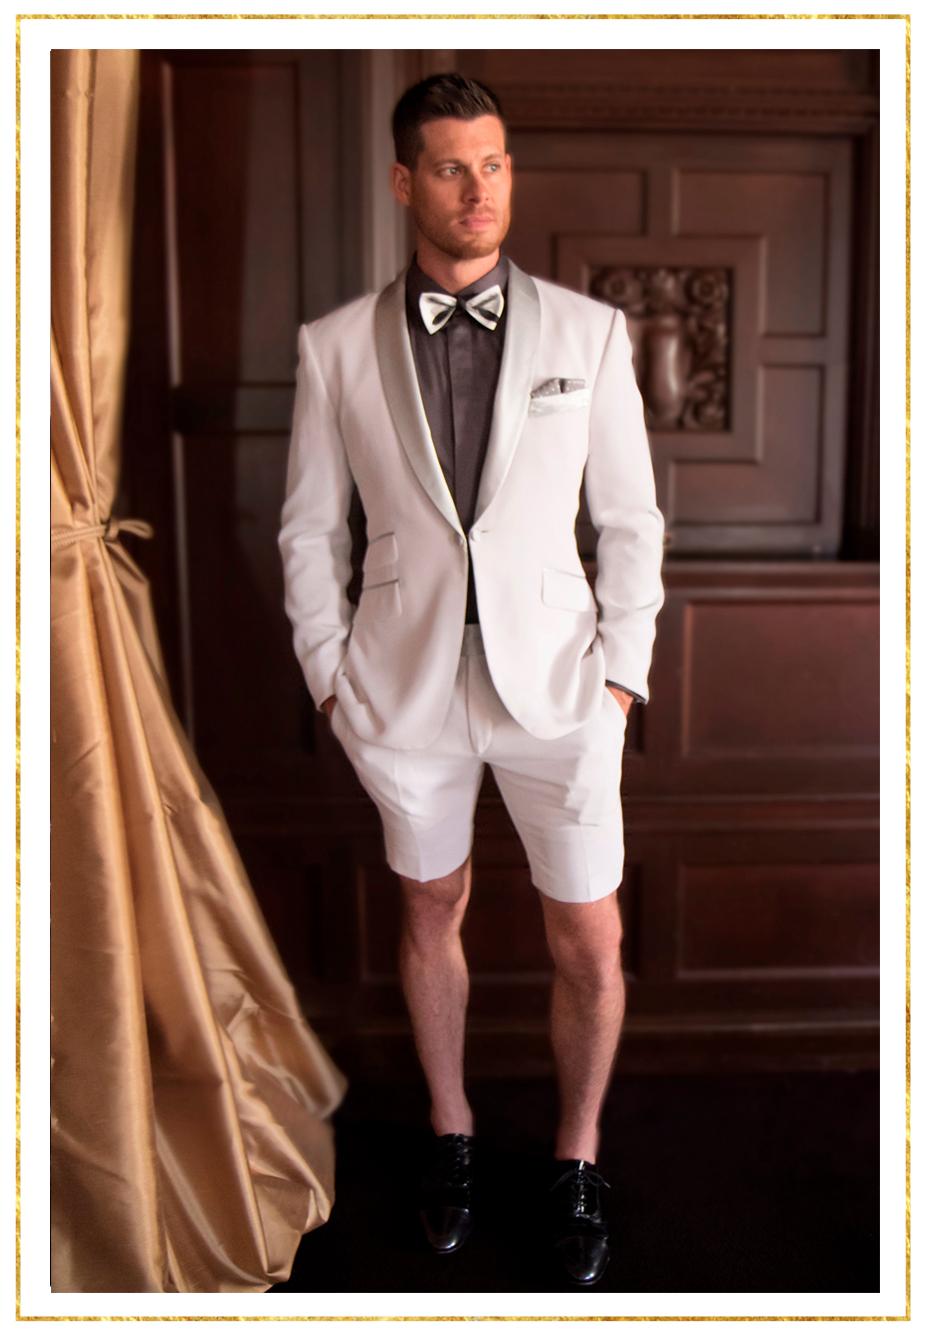 The Marcello Satin Shawl Tuxedo with Short